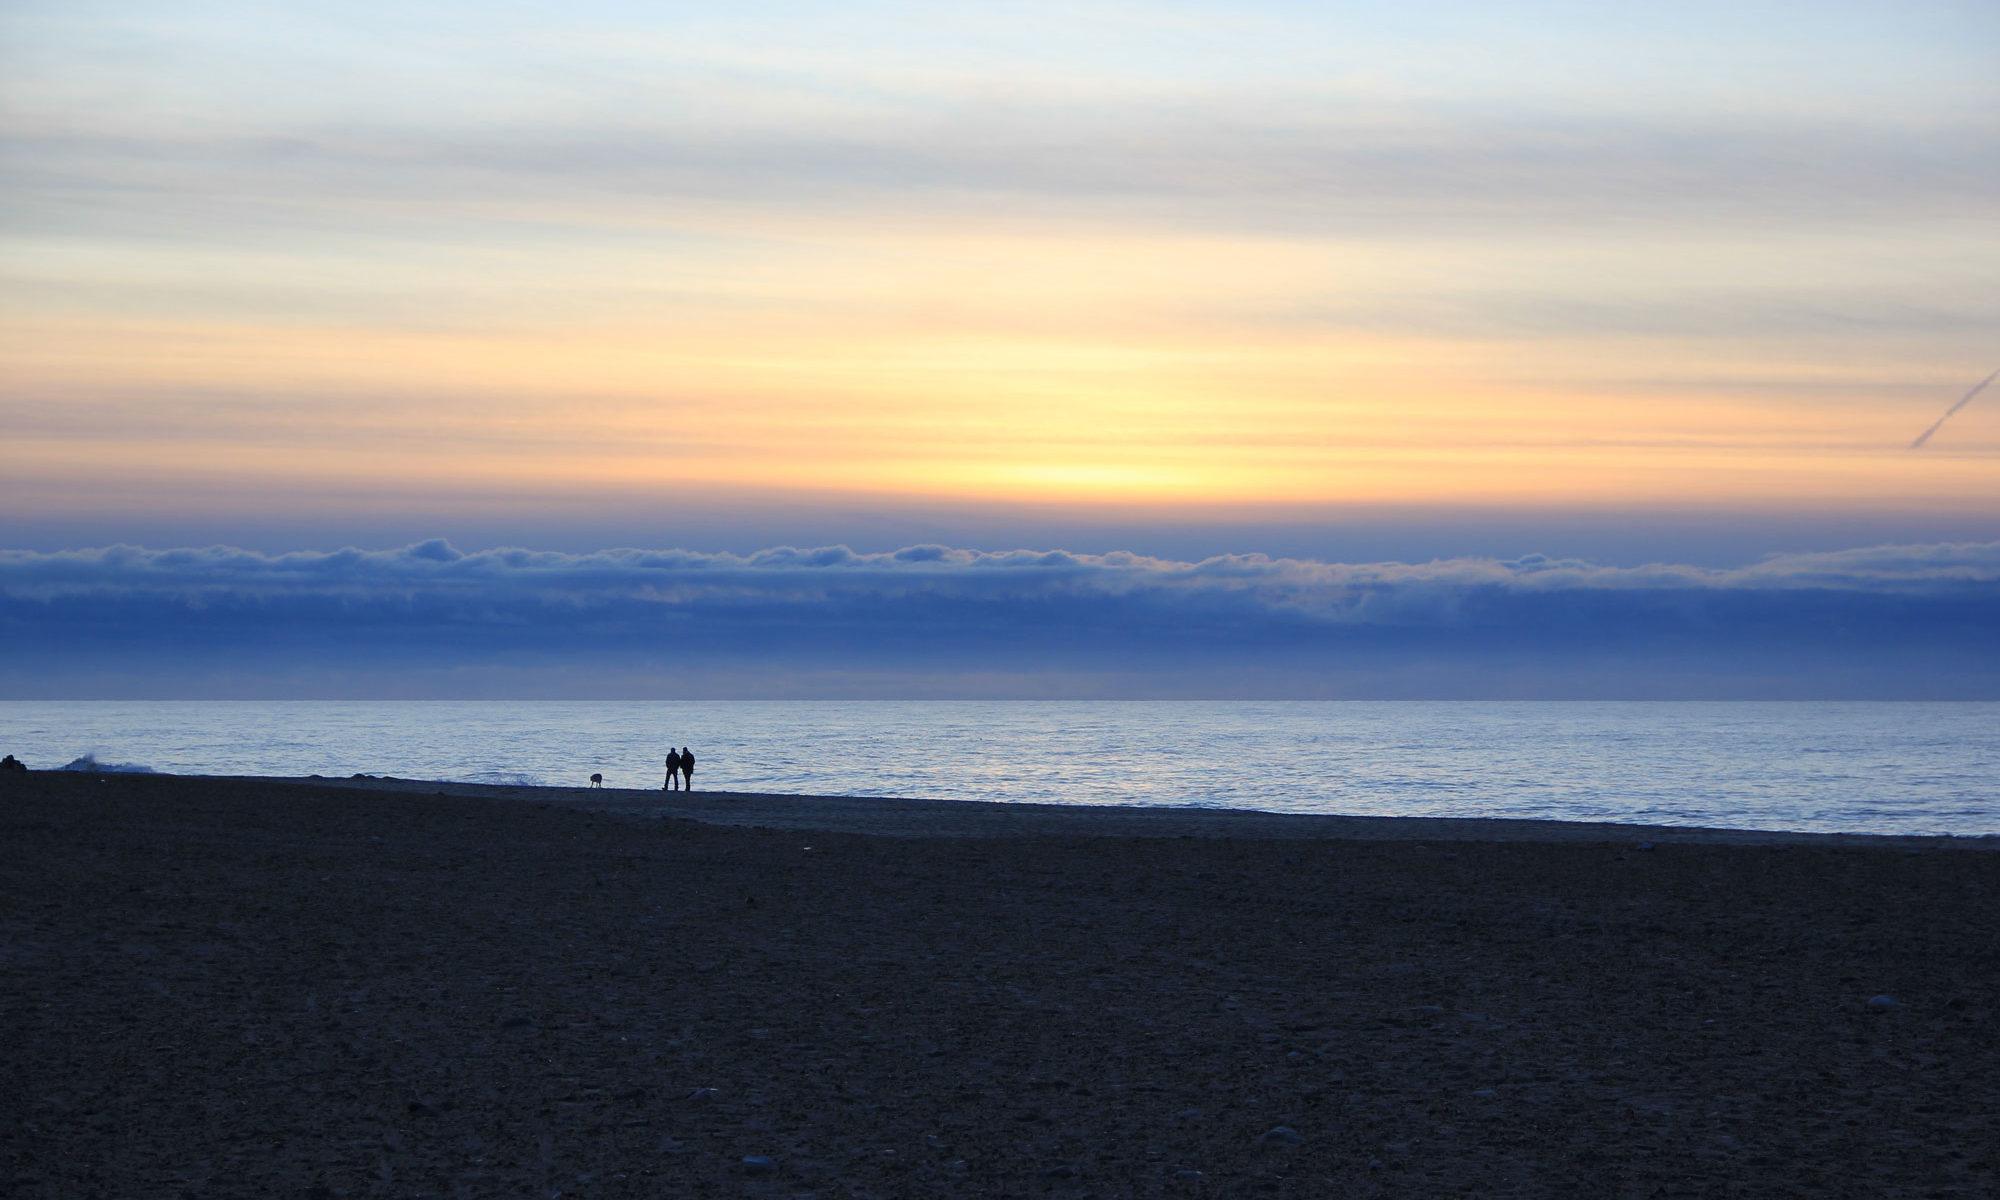 Nordsee Strandgang - Ralf Struß